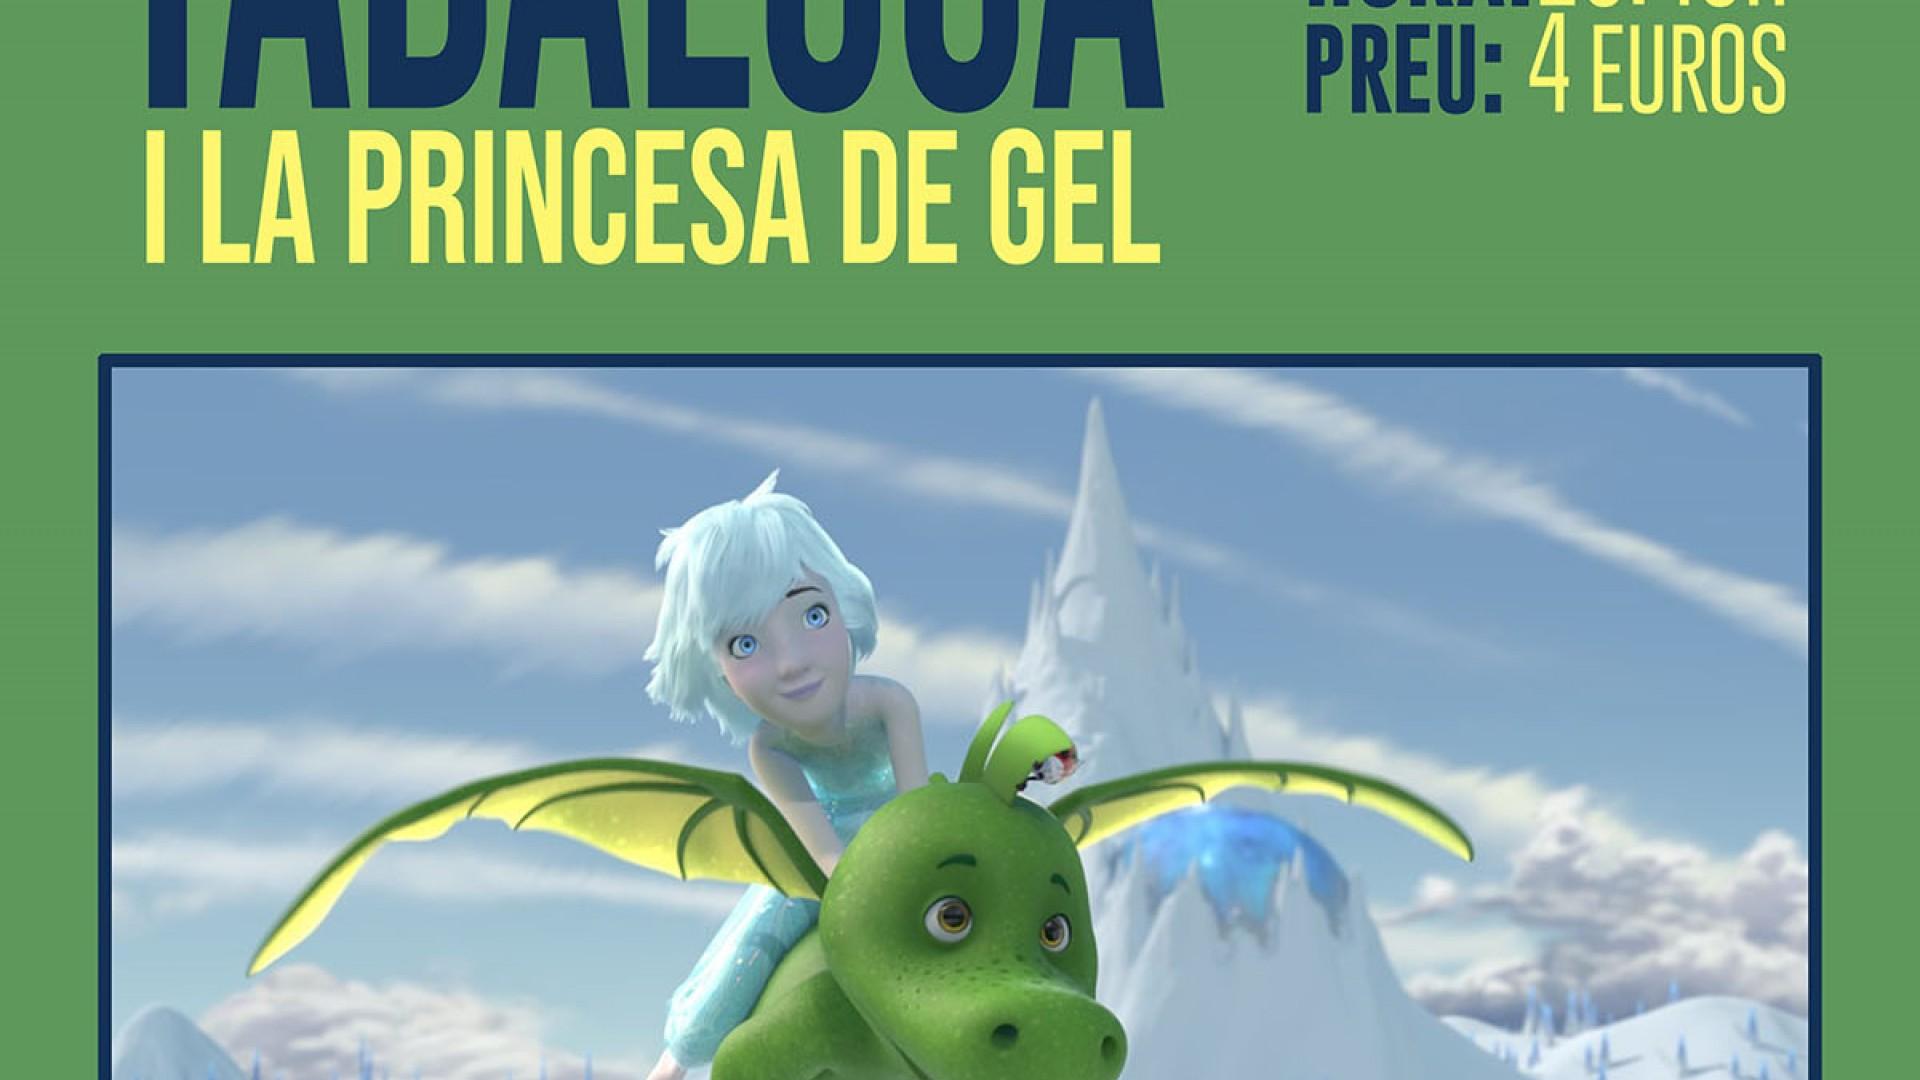 Torna CineCiutat Nins: Tabaluga i la princesa de gel